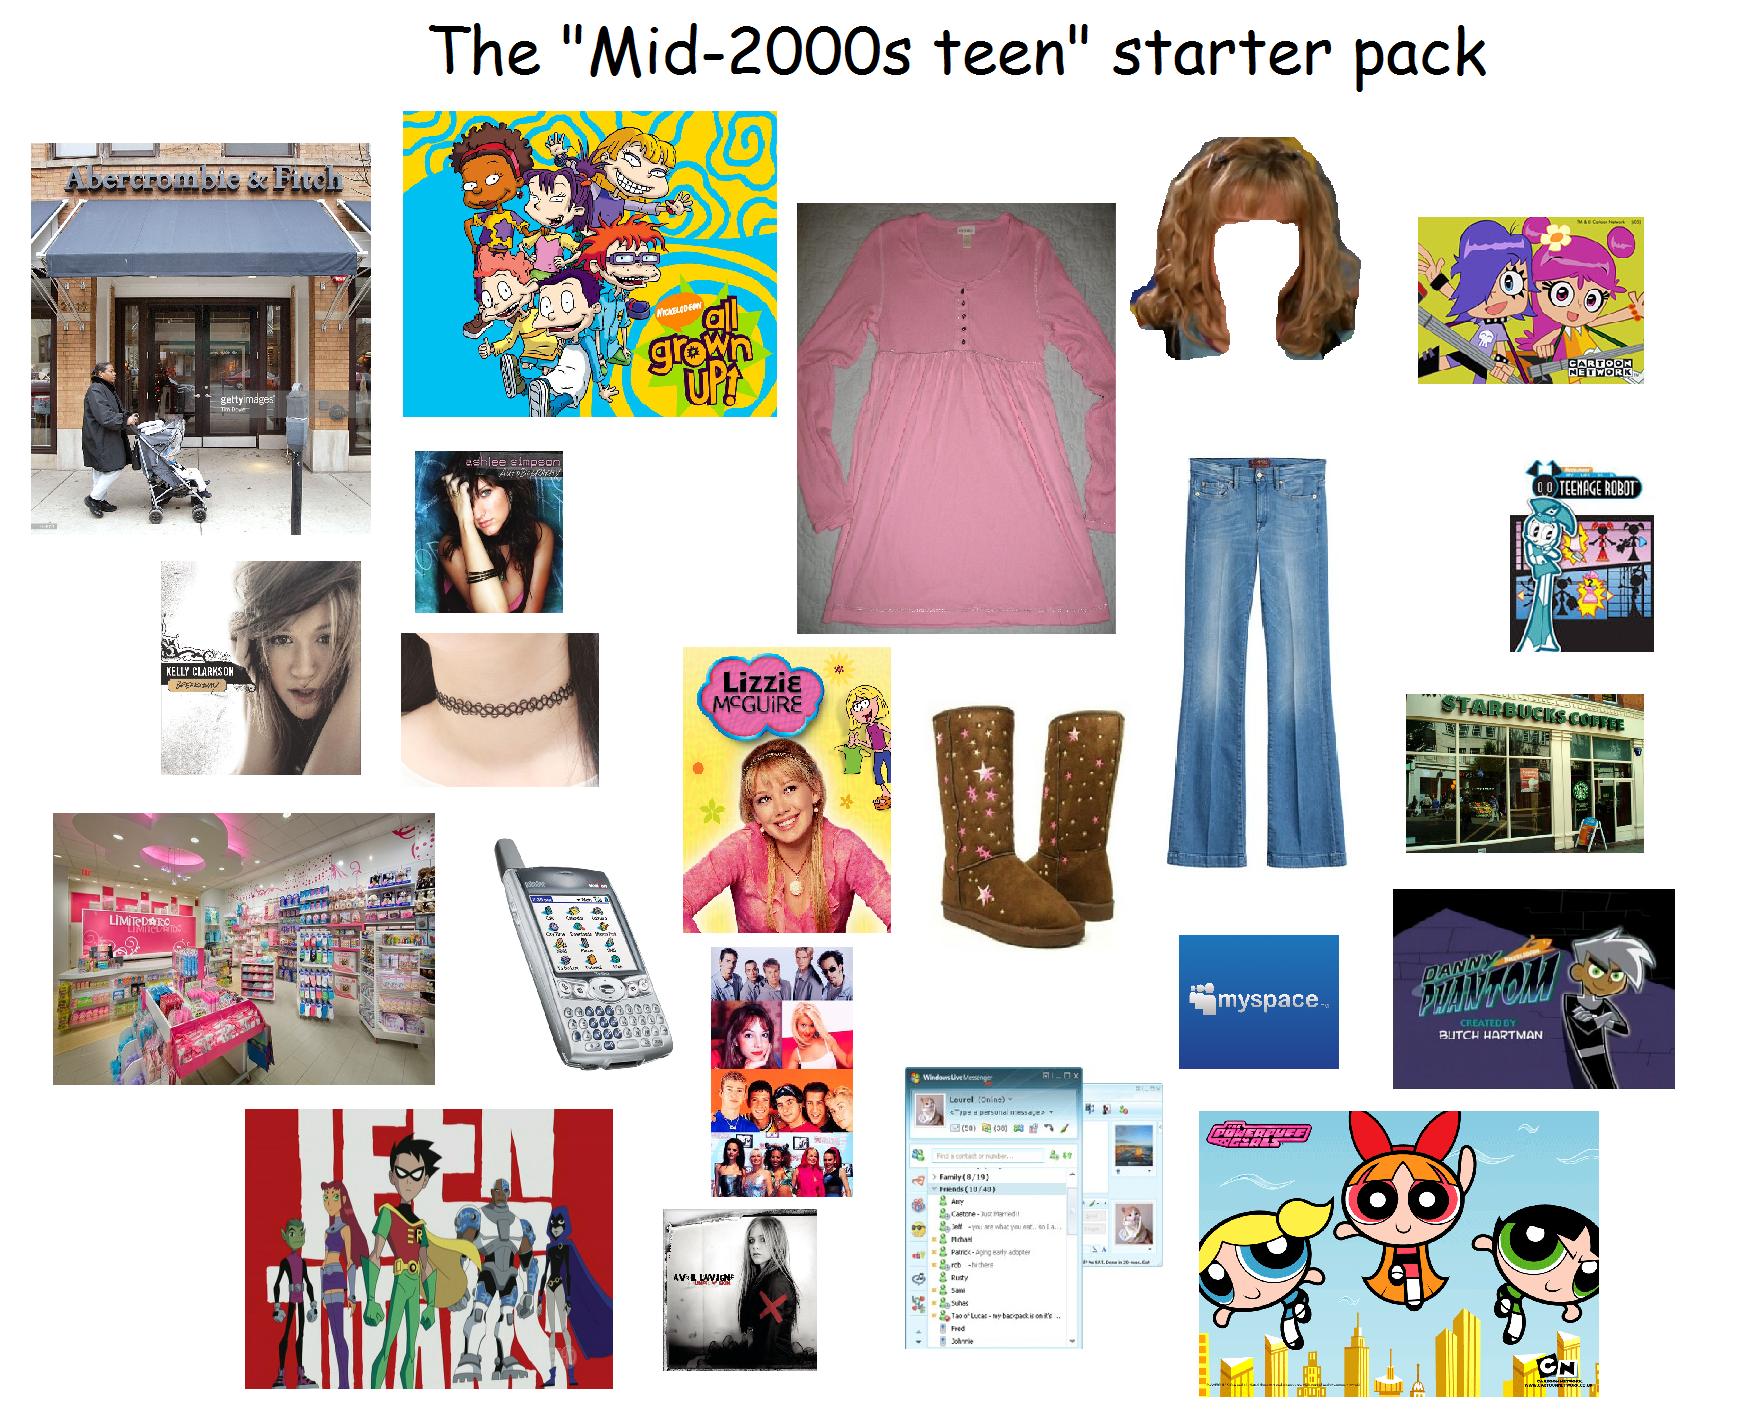 30s dating teenager starter pack